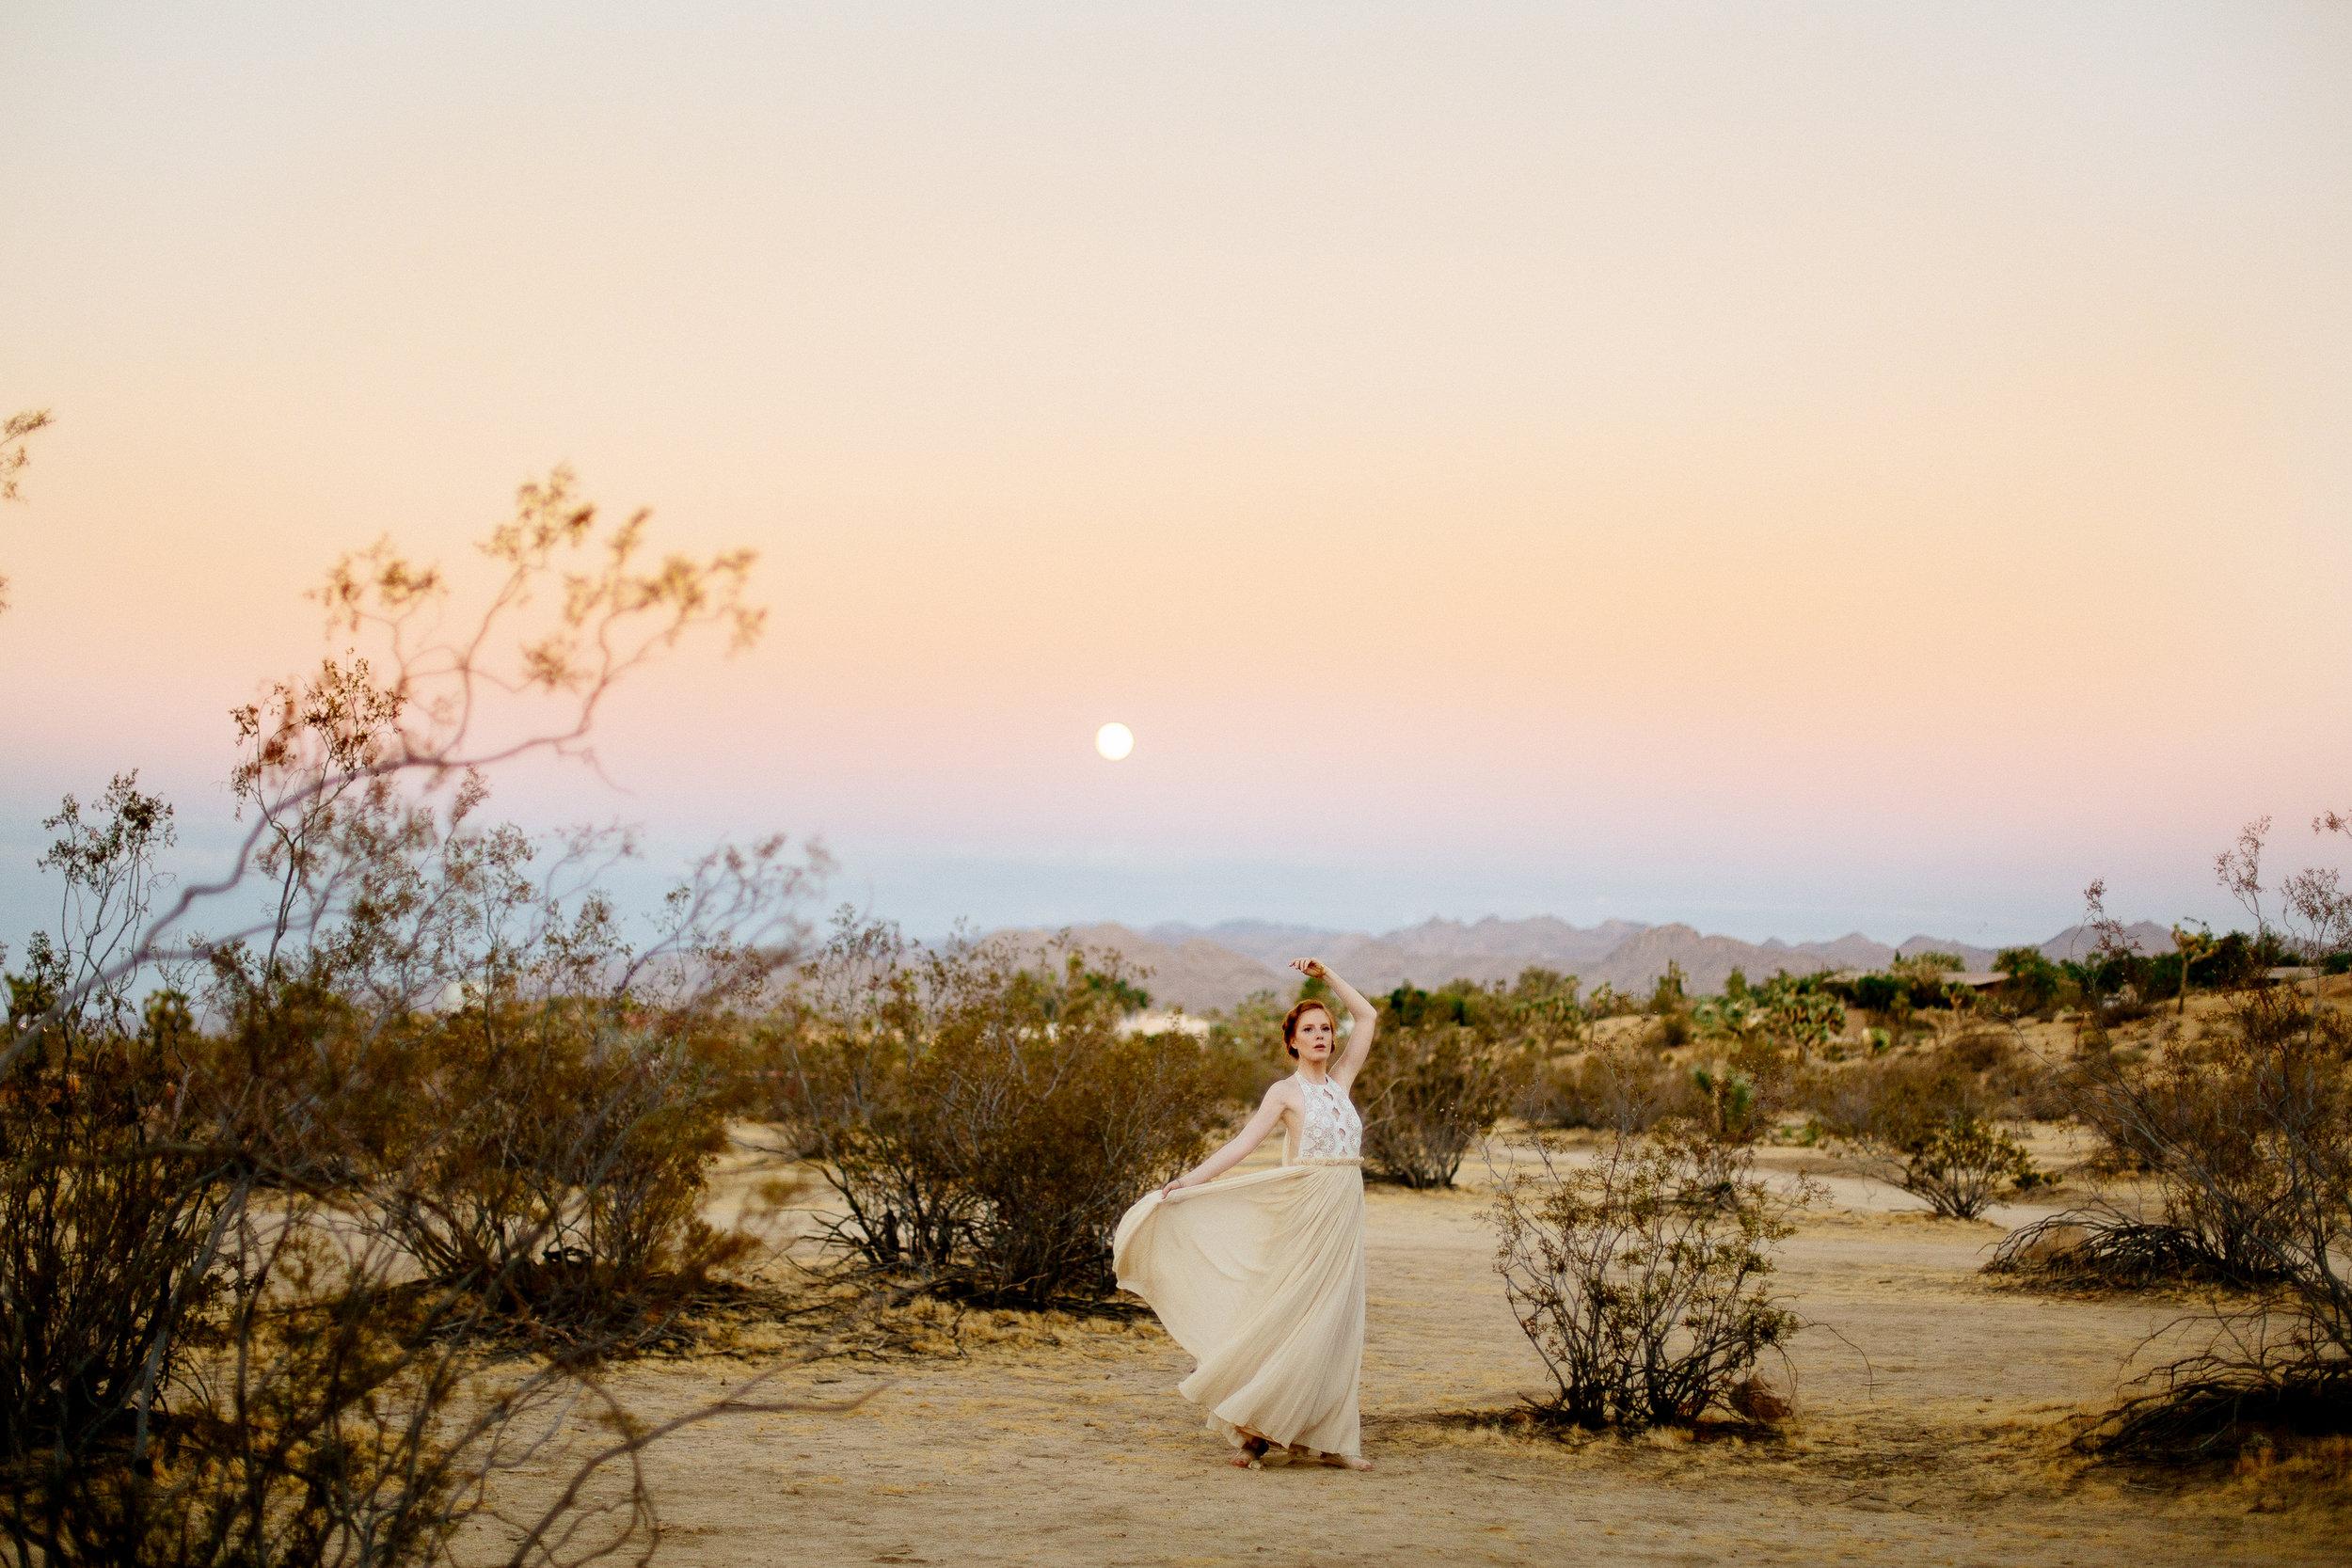 Jen_Montgomery_Photography_dancemoon-1.jpg